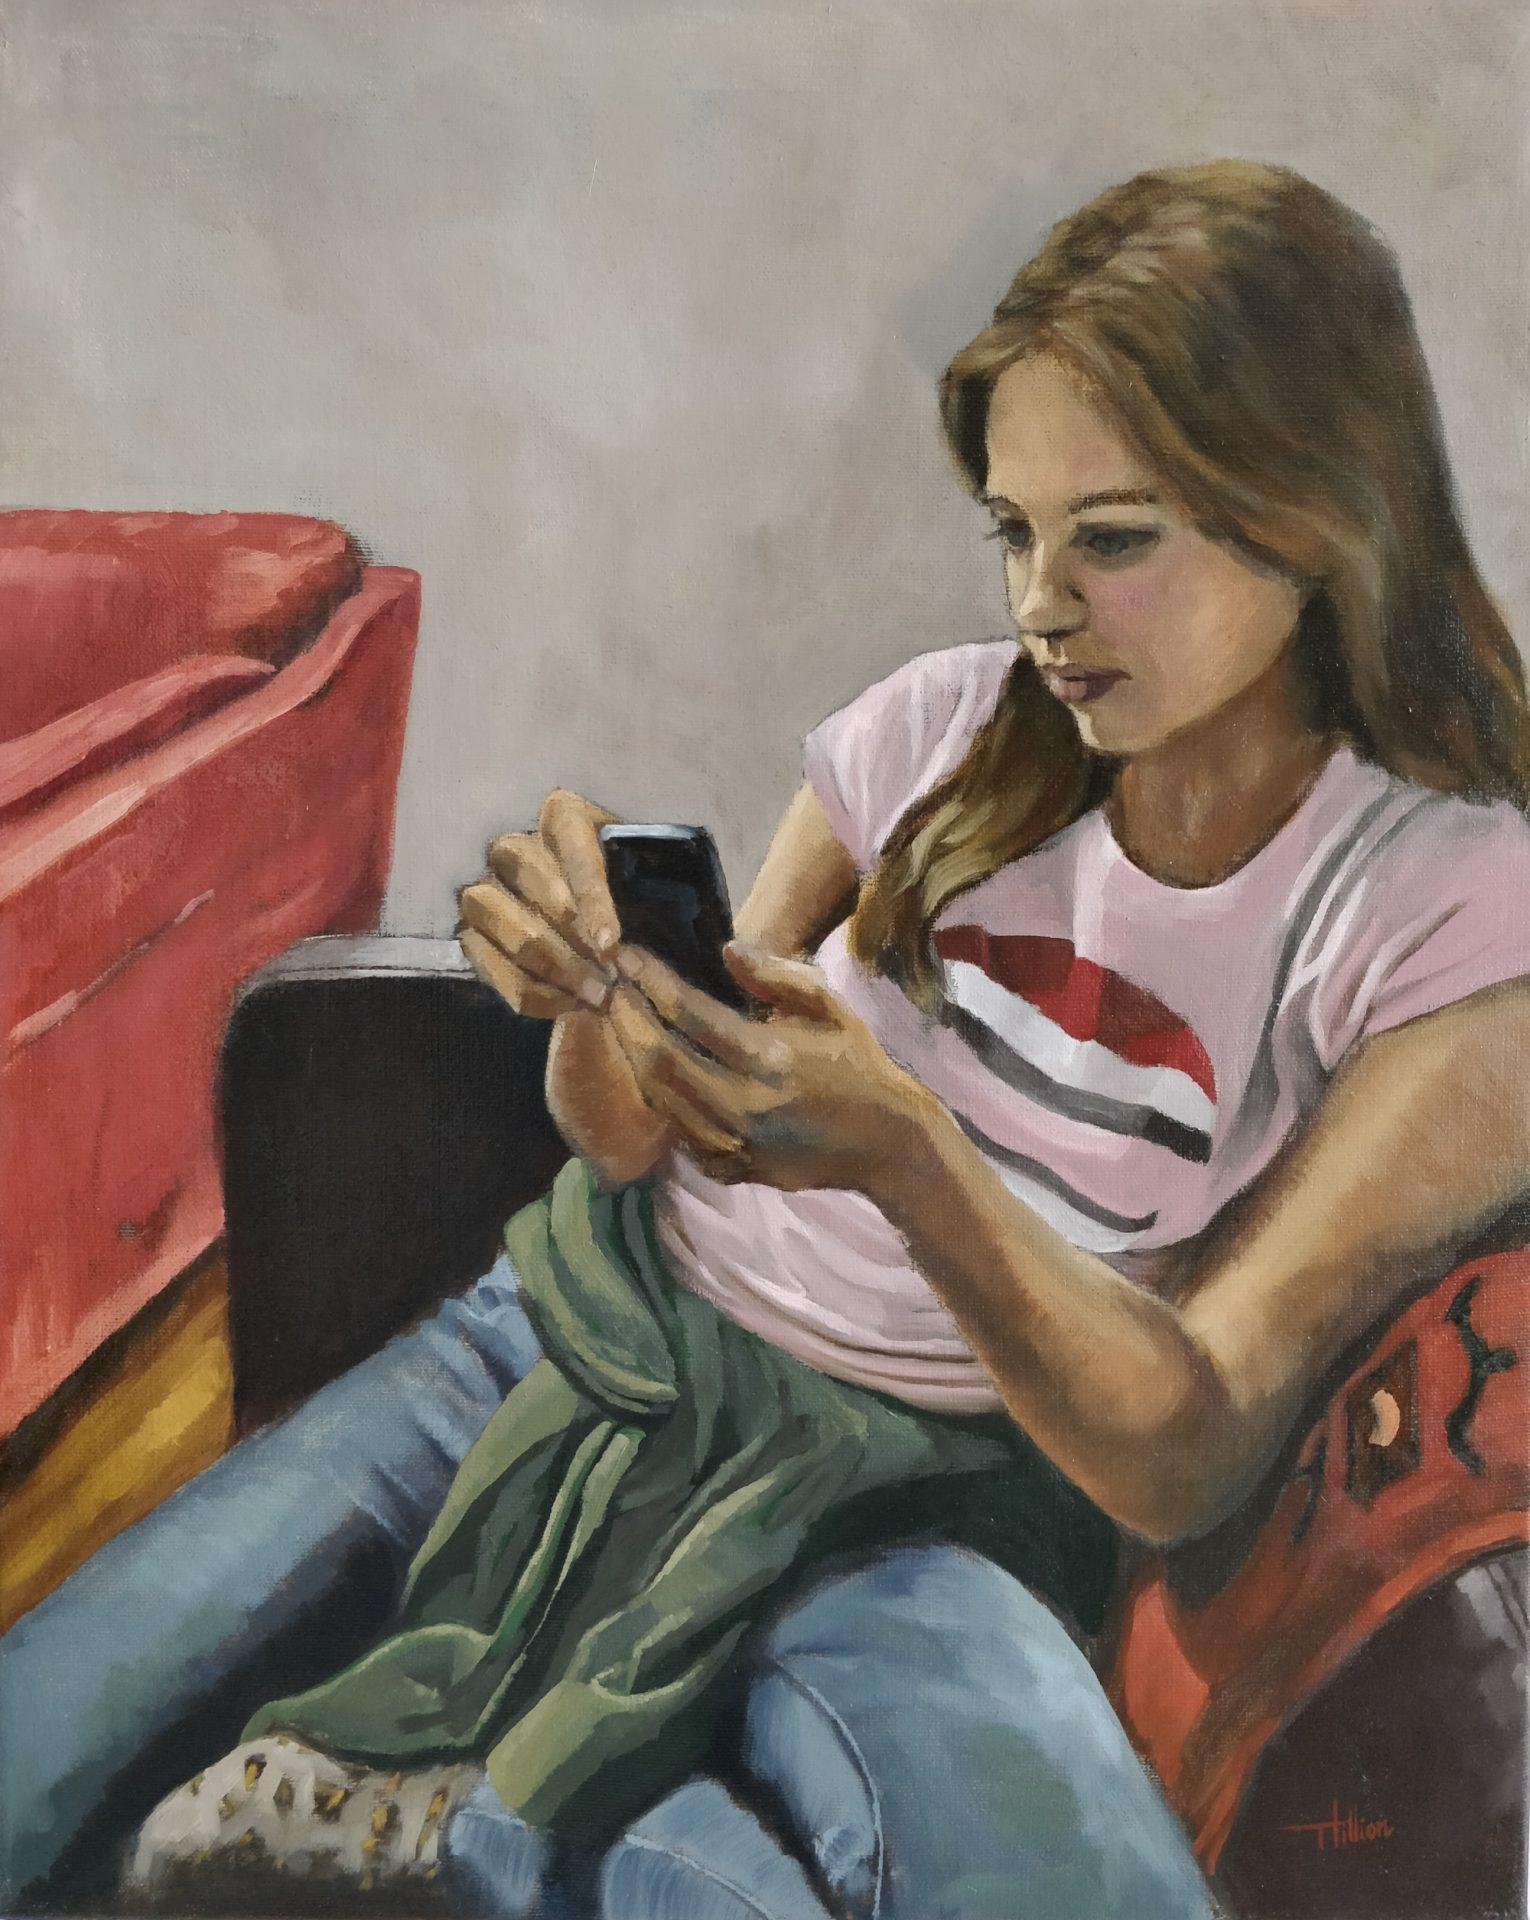 Ciële by Tania Hillion